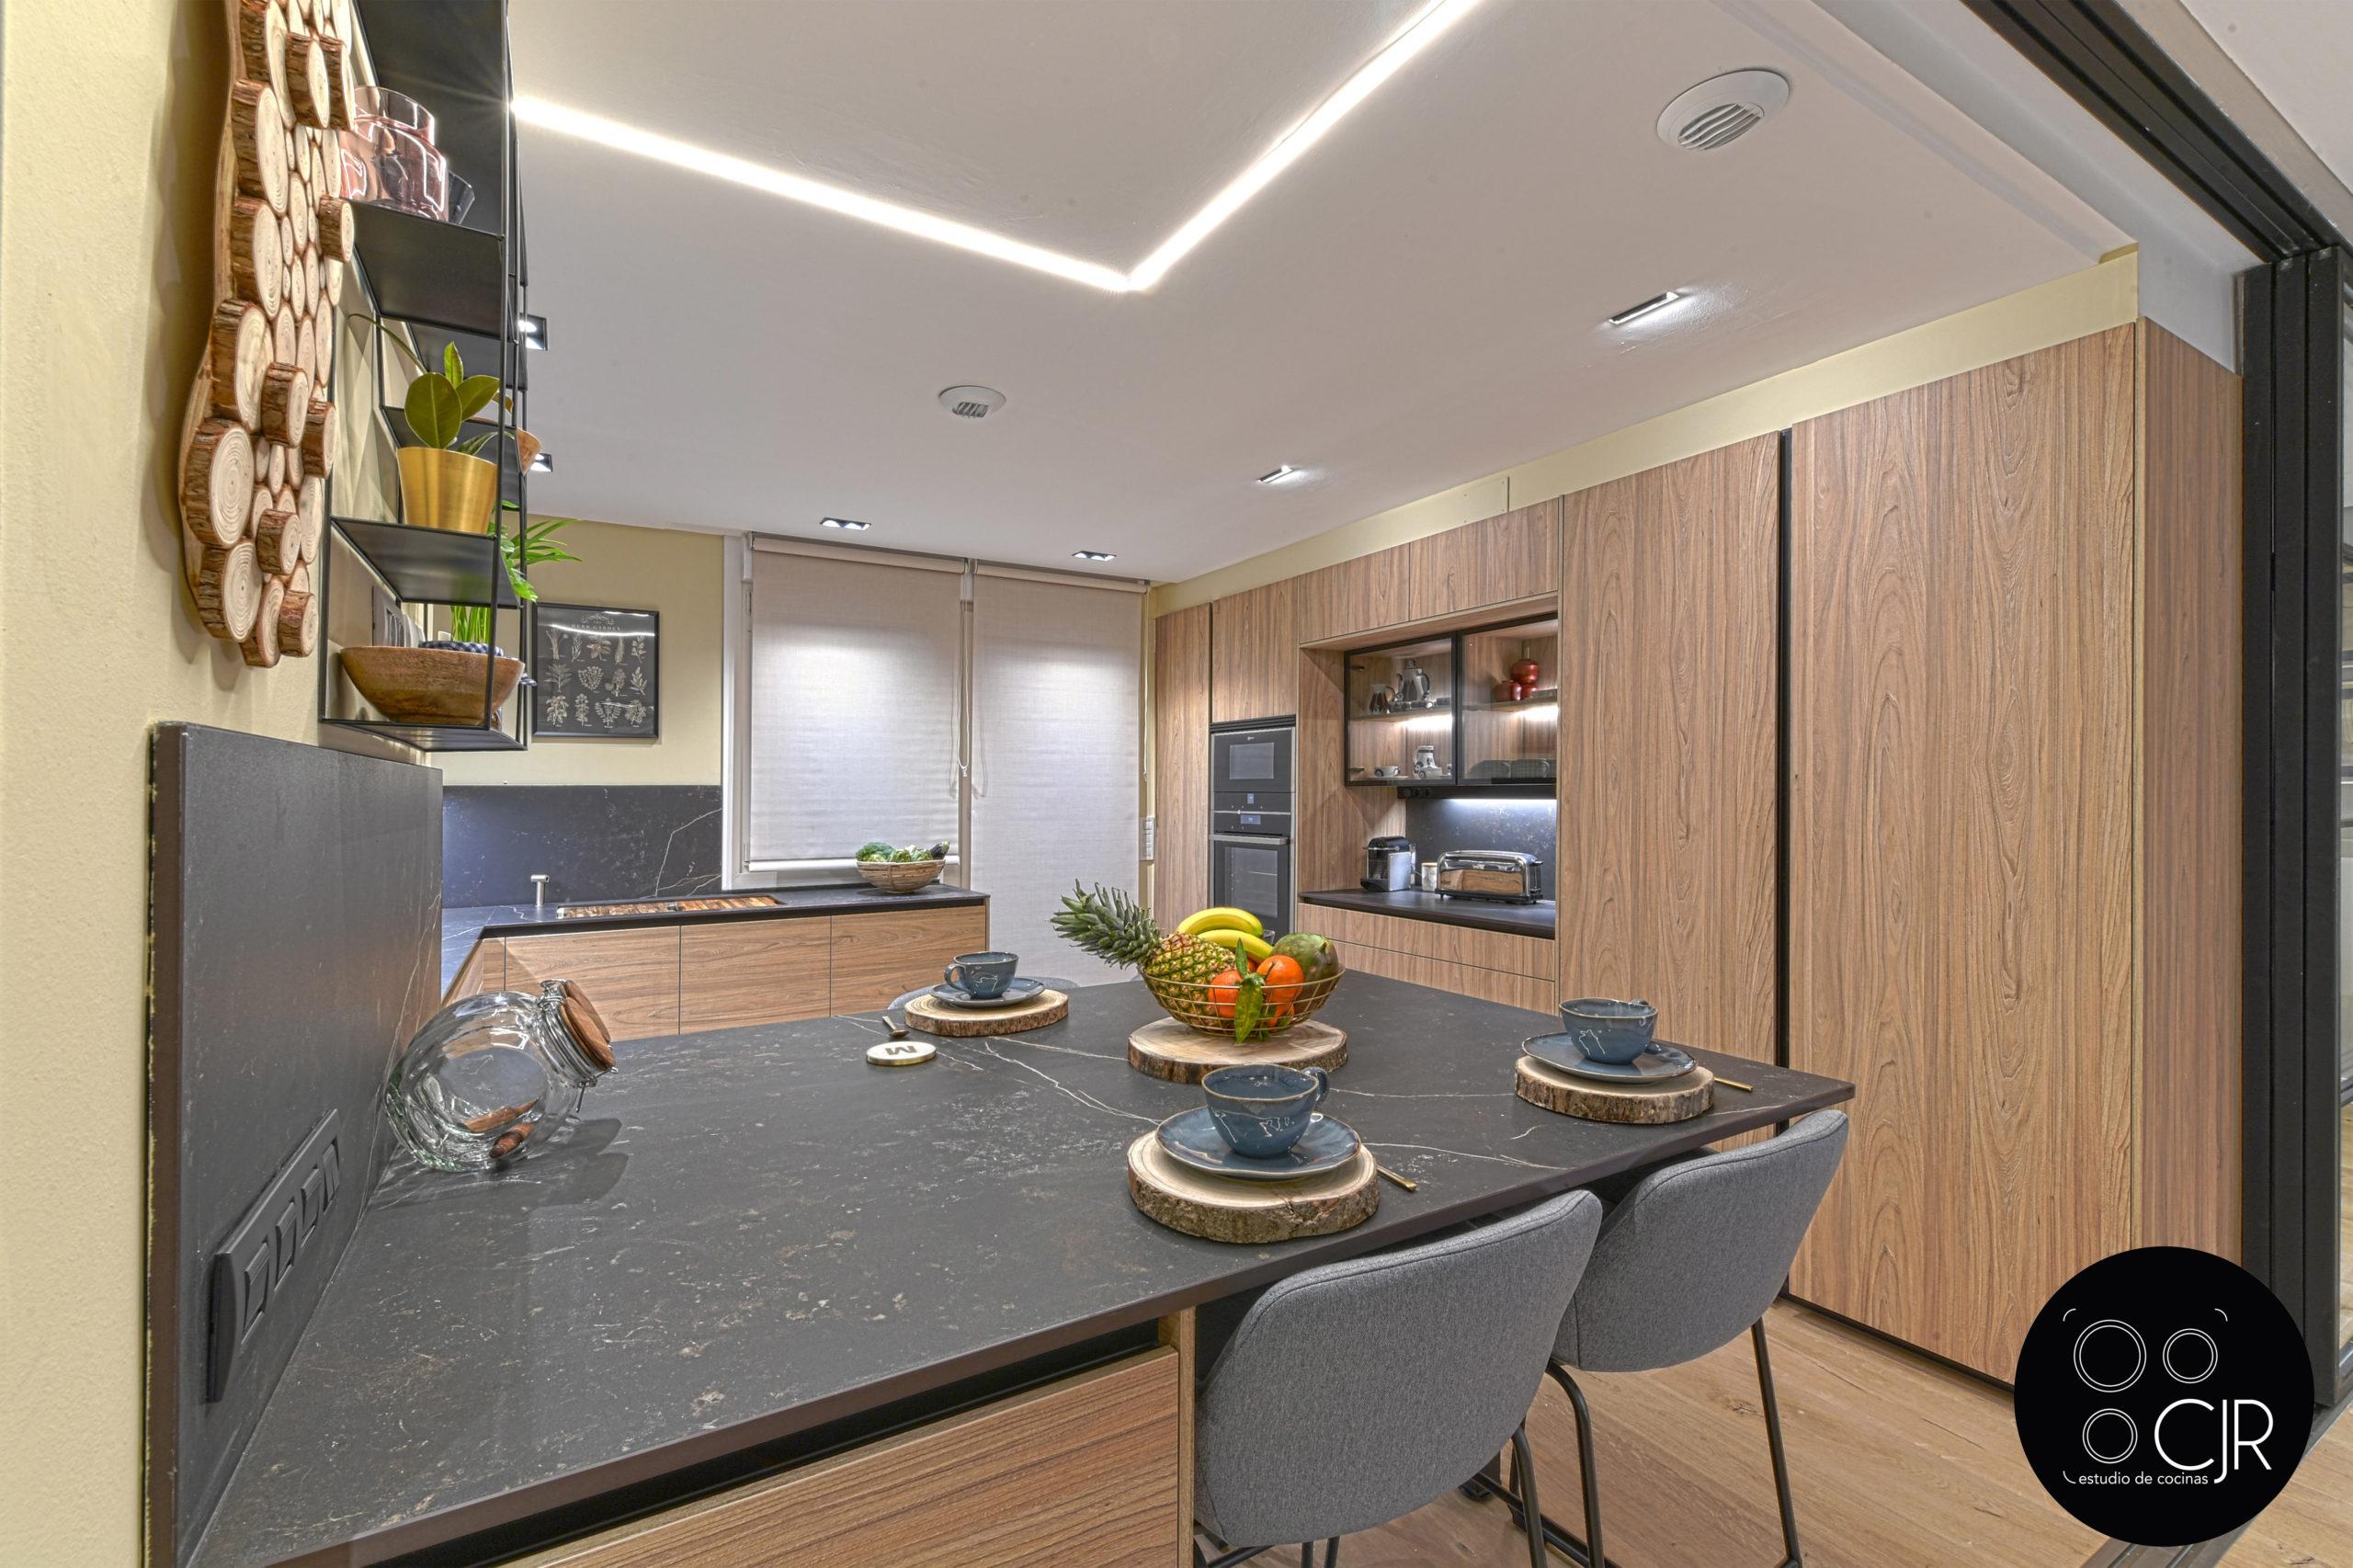 Vista general cocina moderna negra y madera